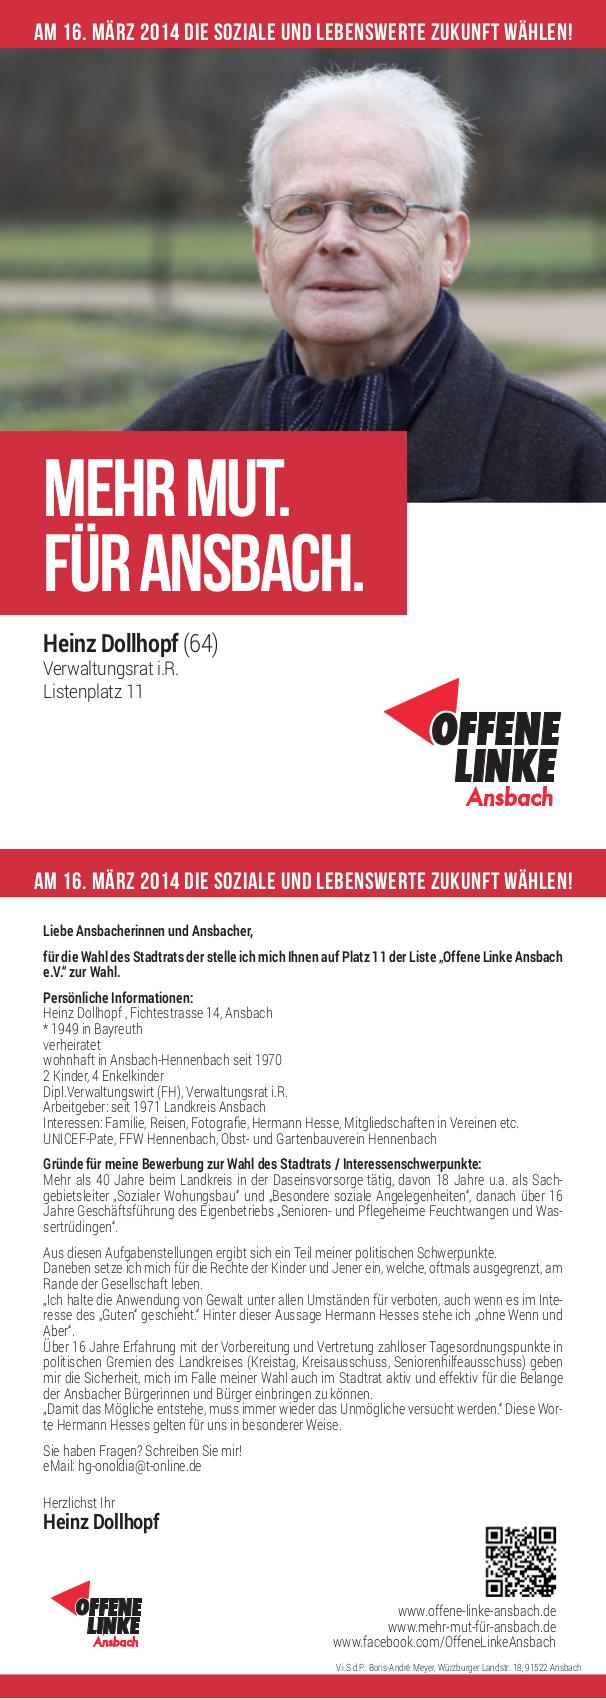 Heinz_Dollhopf